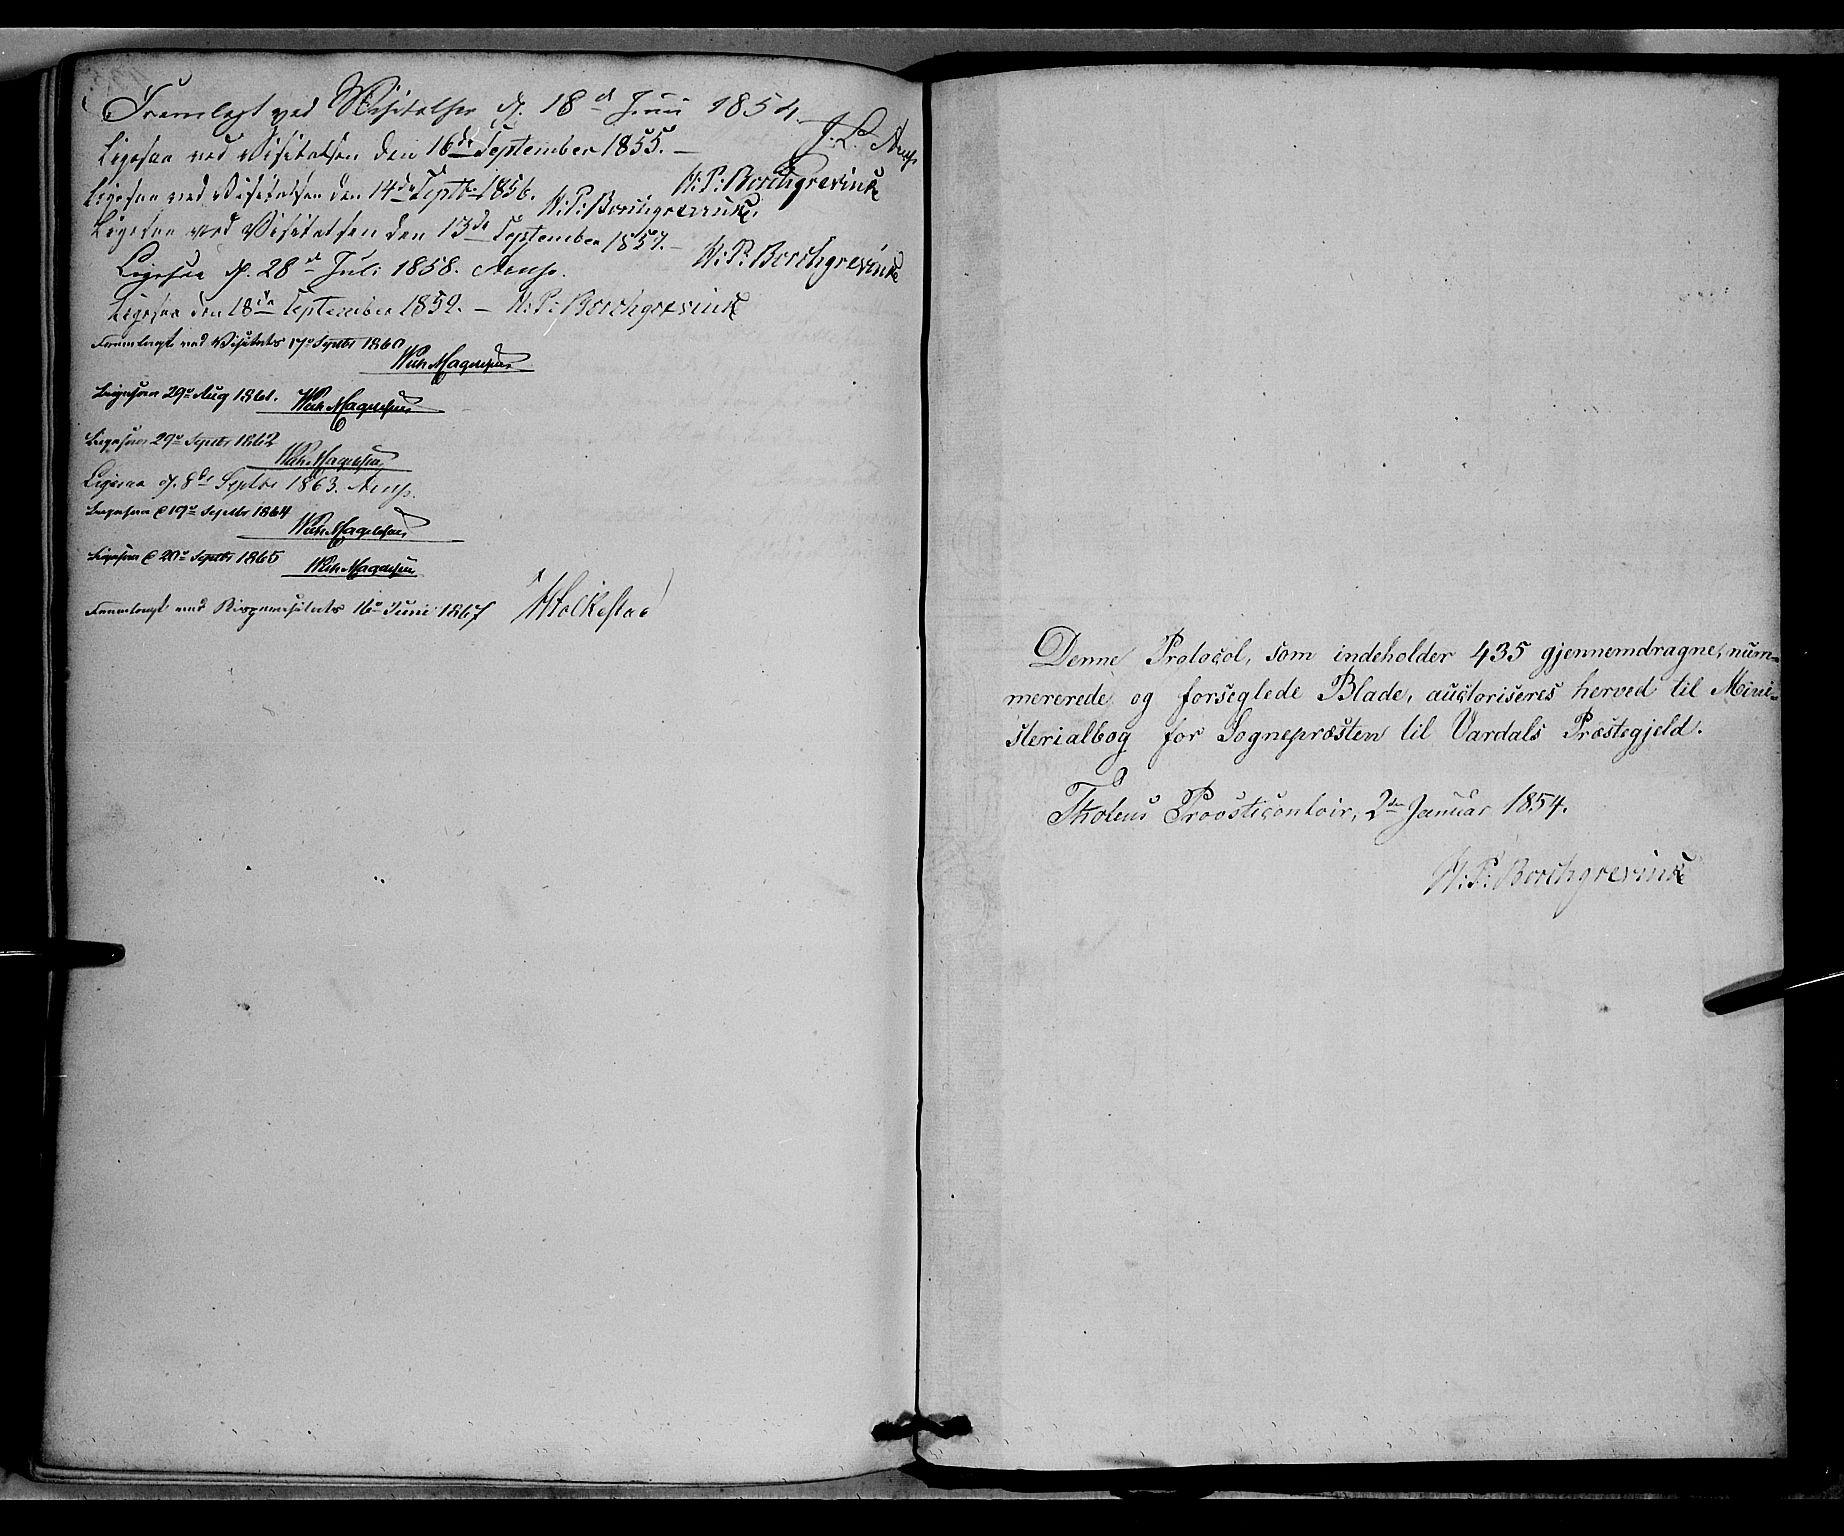 SAH, Vardal prestekontor, H/Ha/Haa/L0006: Ministerialbok nr. 6, 1854-1866